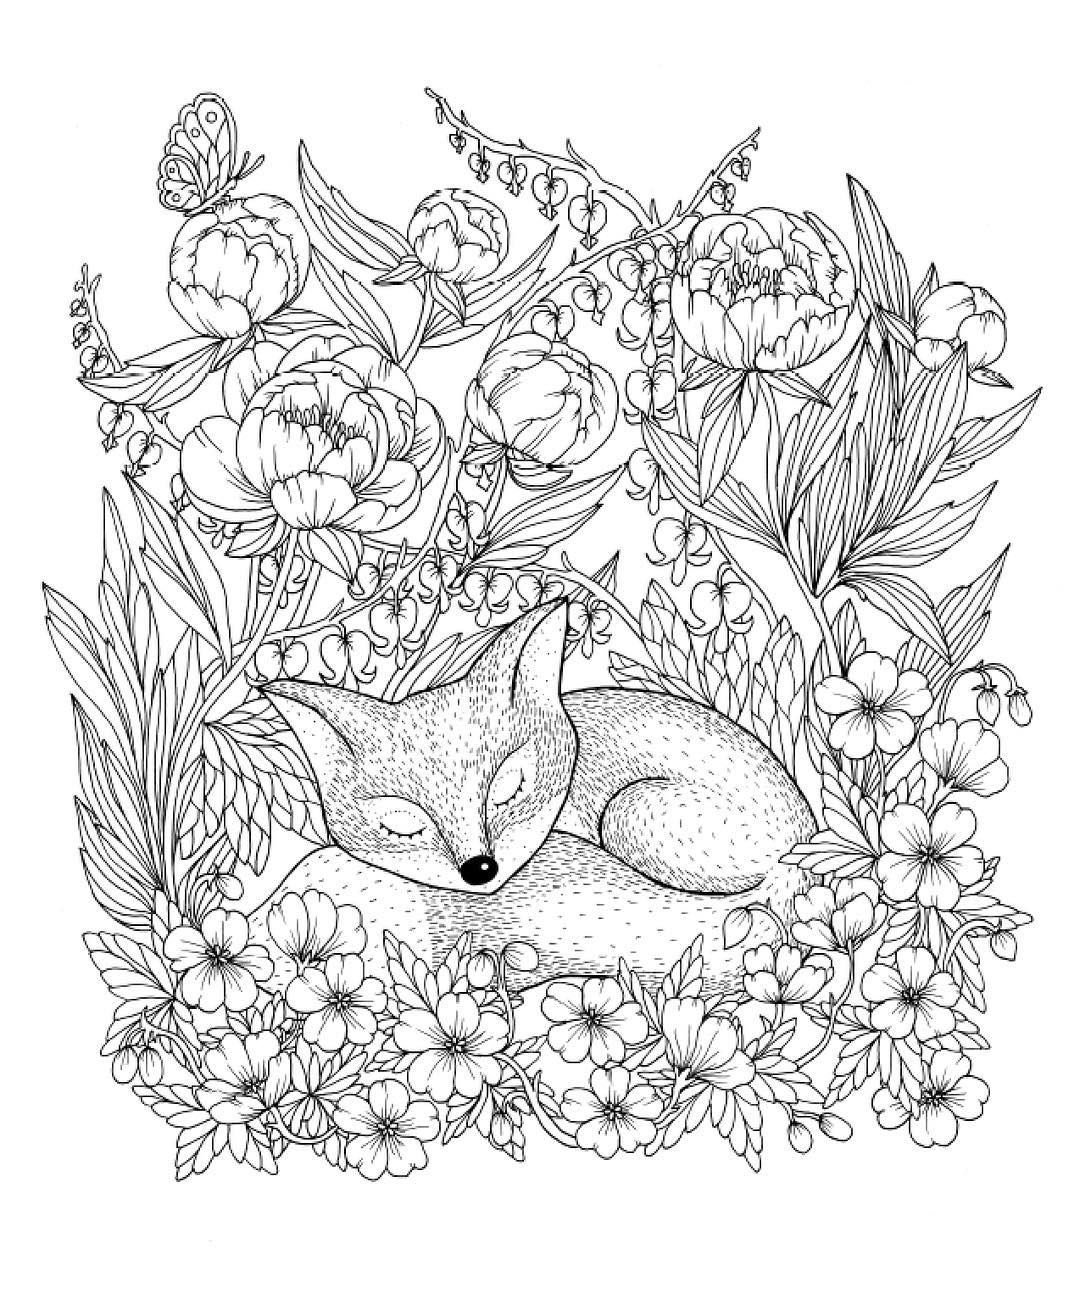 sleeping fox amongst the ranunculus - Fox Coloring Book